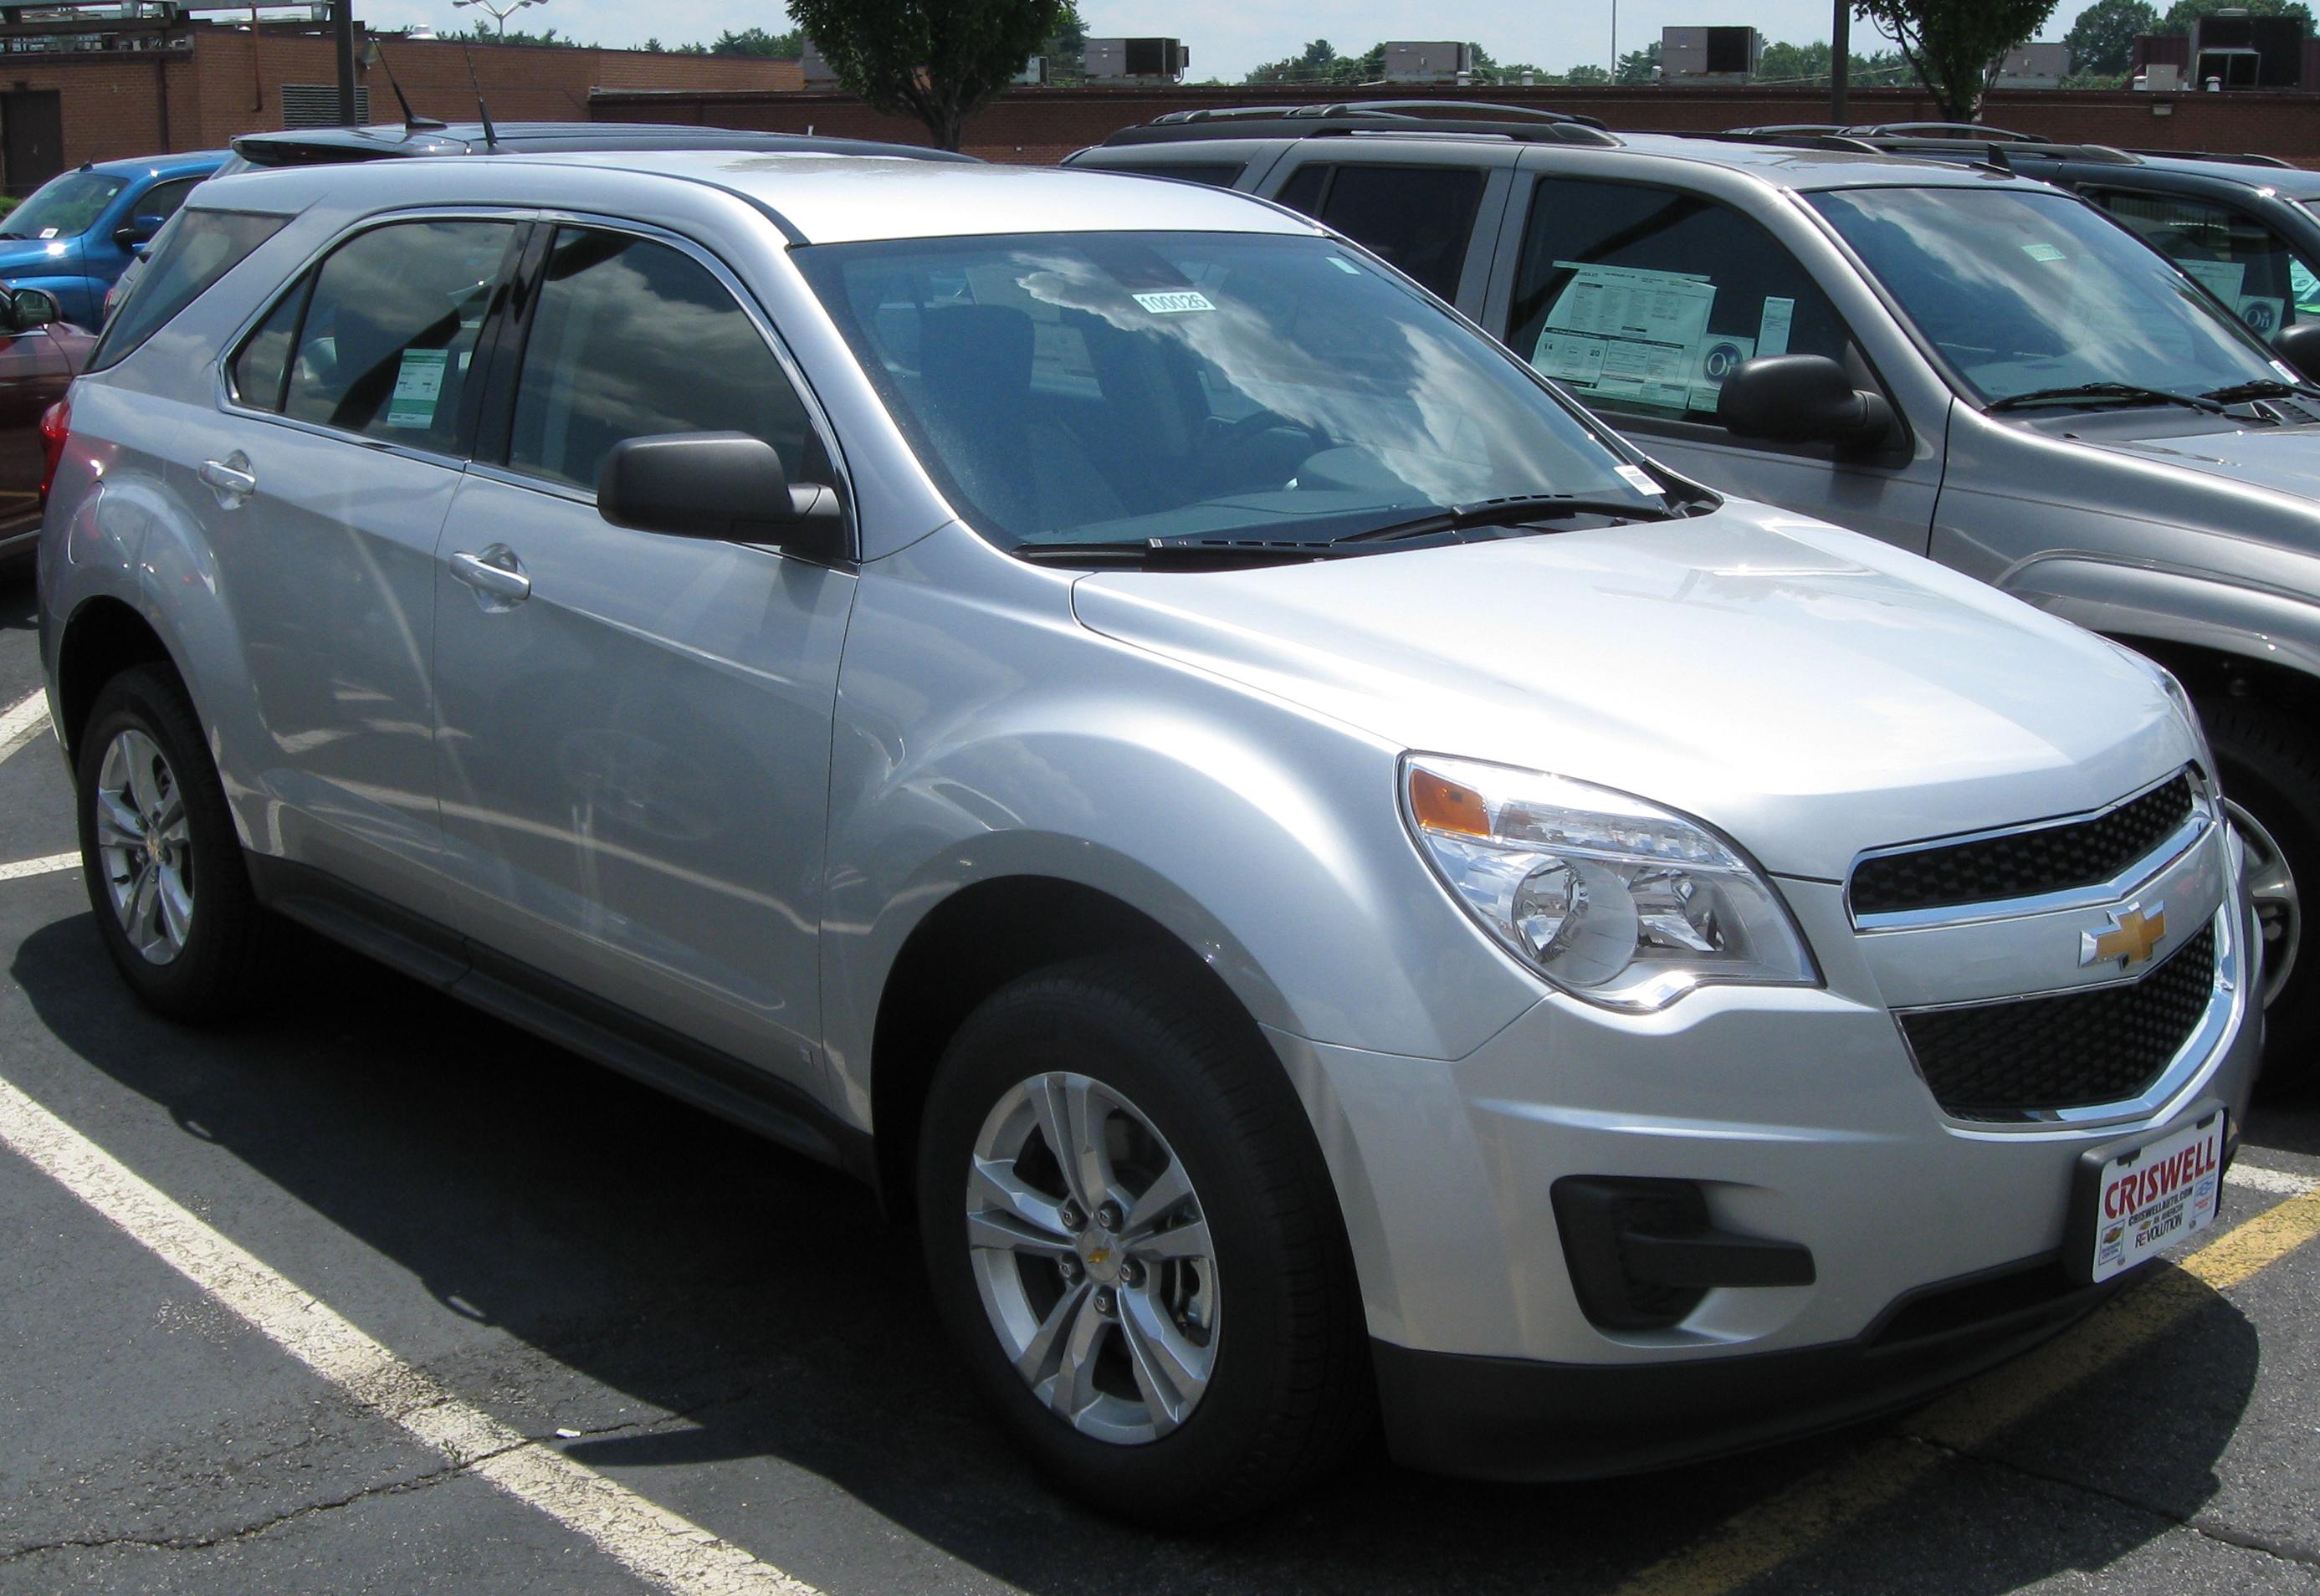 Chevrolet Equinox Usa >> File:2010 Chevrolet Equinox LS -- 07-01-2009.jpg - Wikimedia Commons